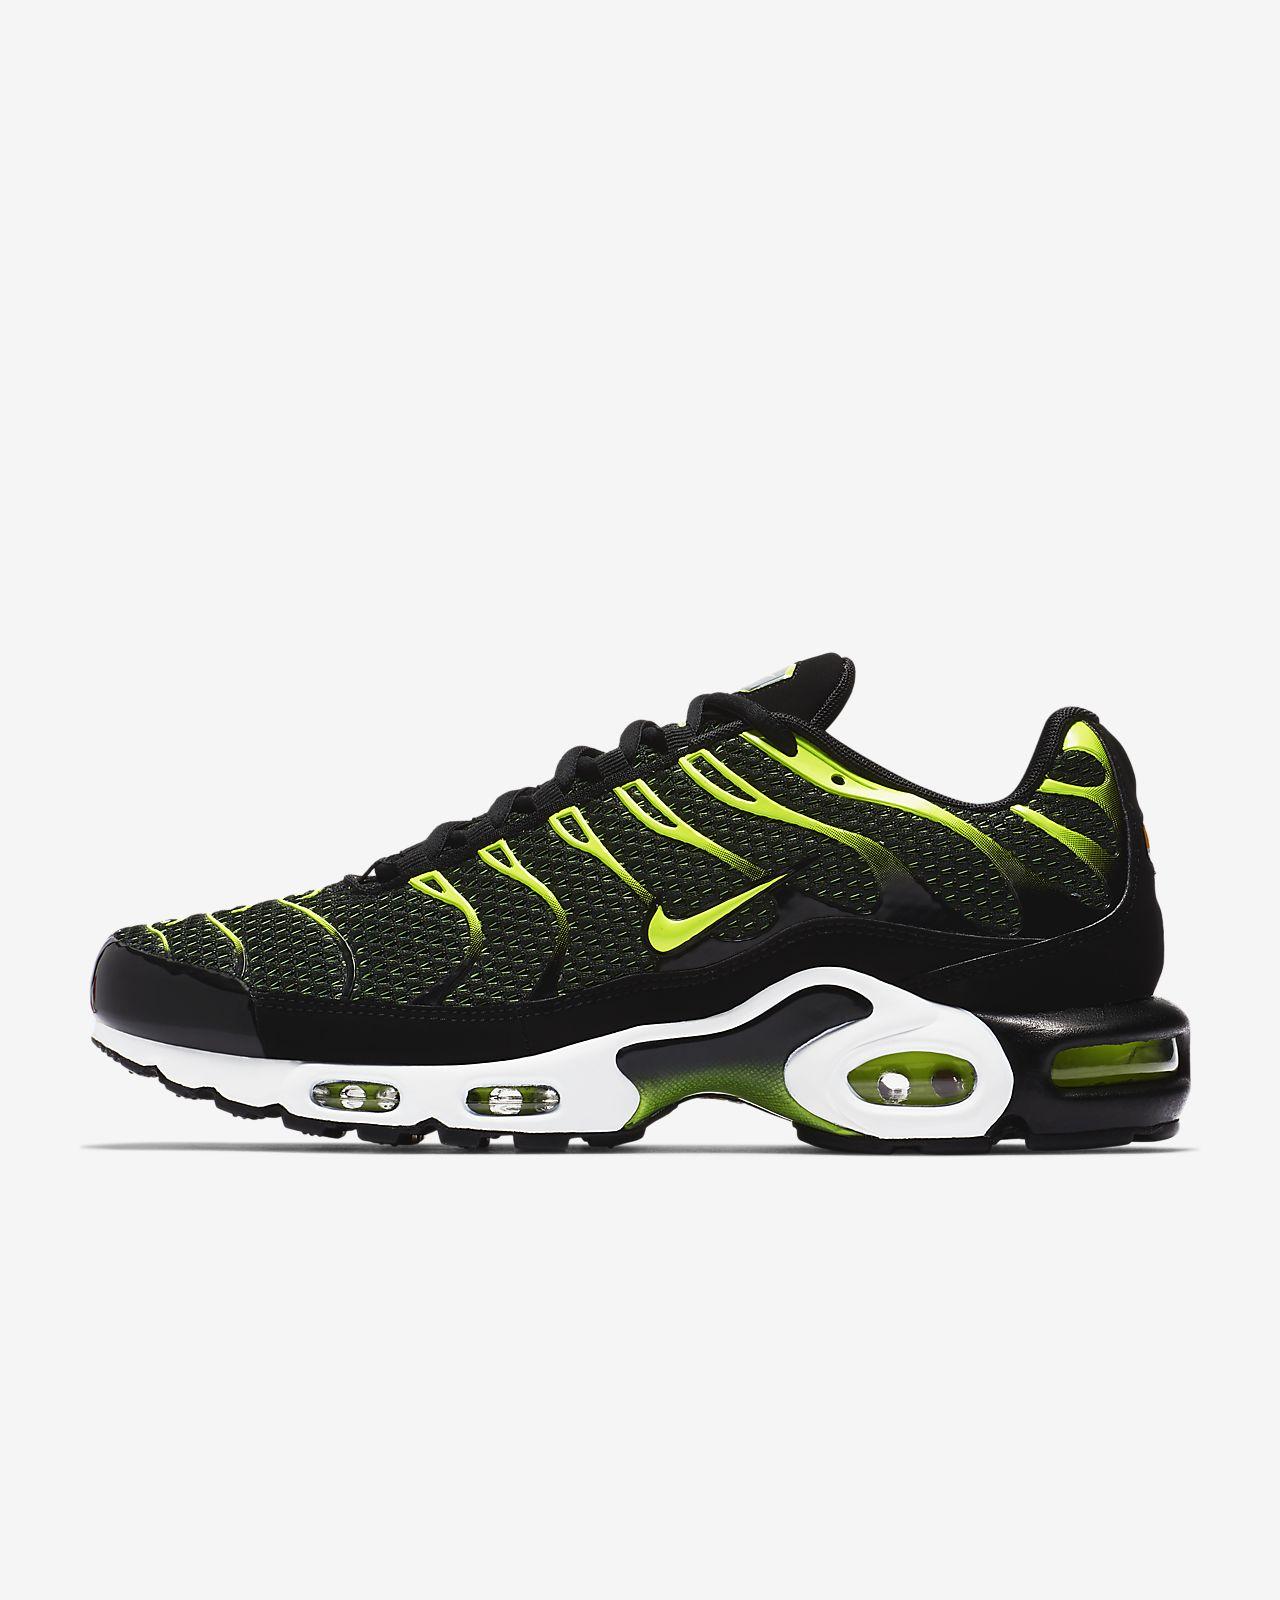 premium selection 363d1 0aaf2 ... Sko Nike Air Max Plus för män